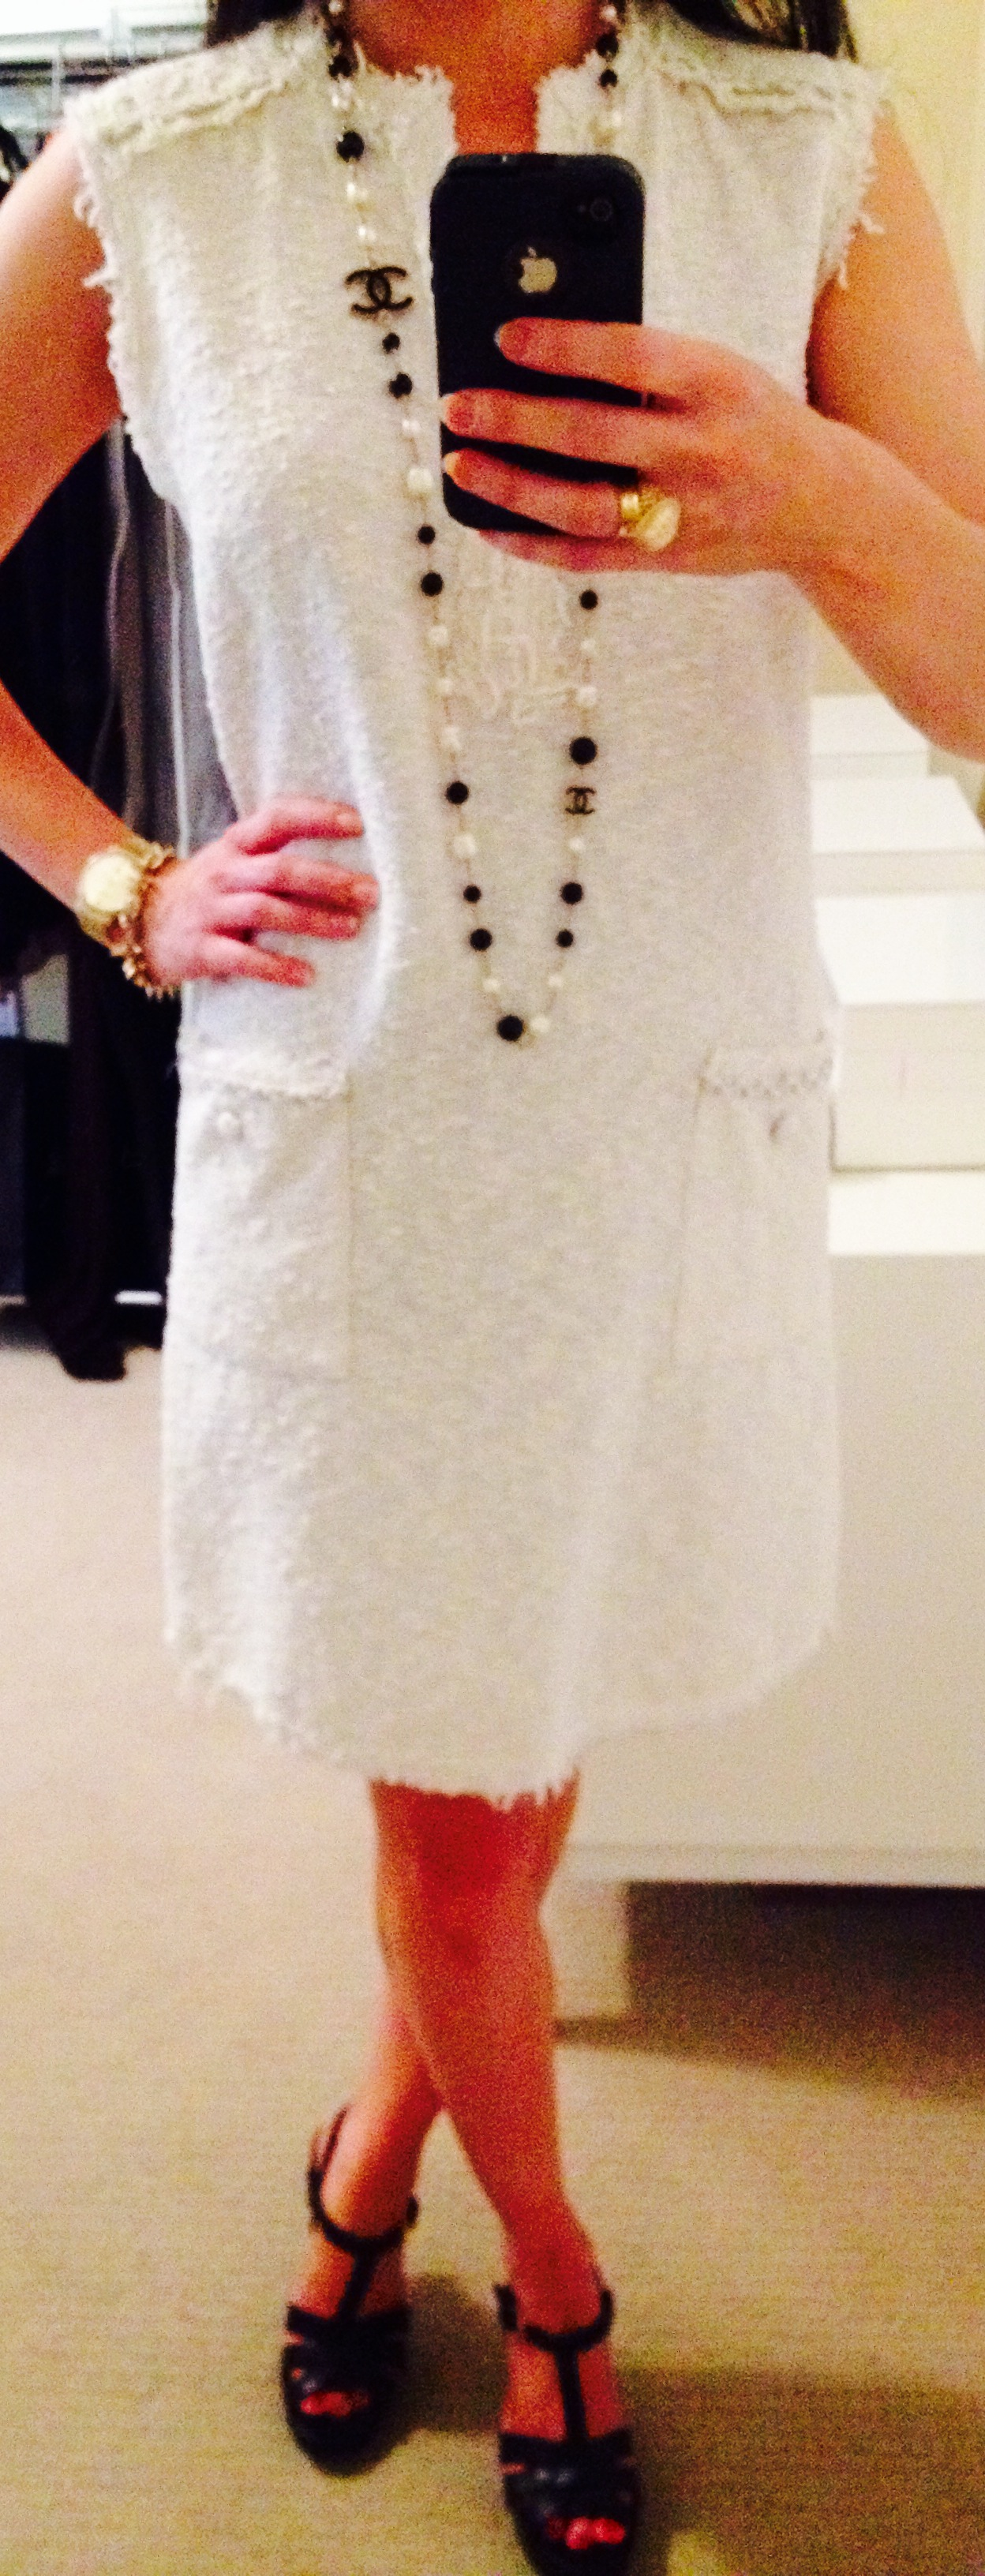 July 22, Chanel Inspired dress by Zara